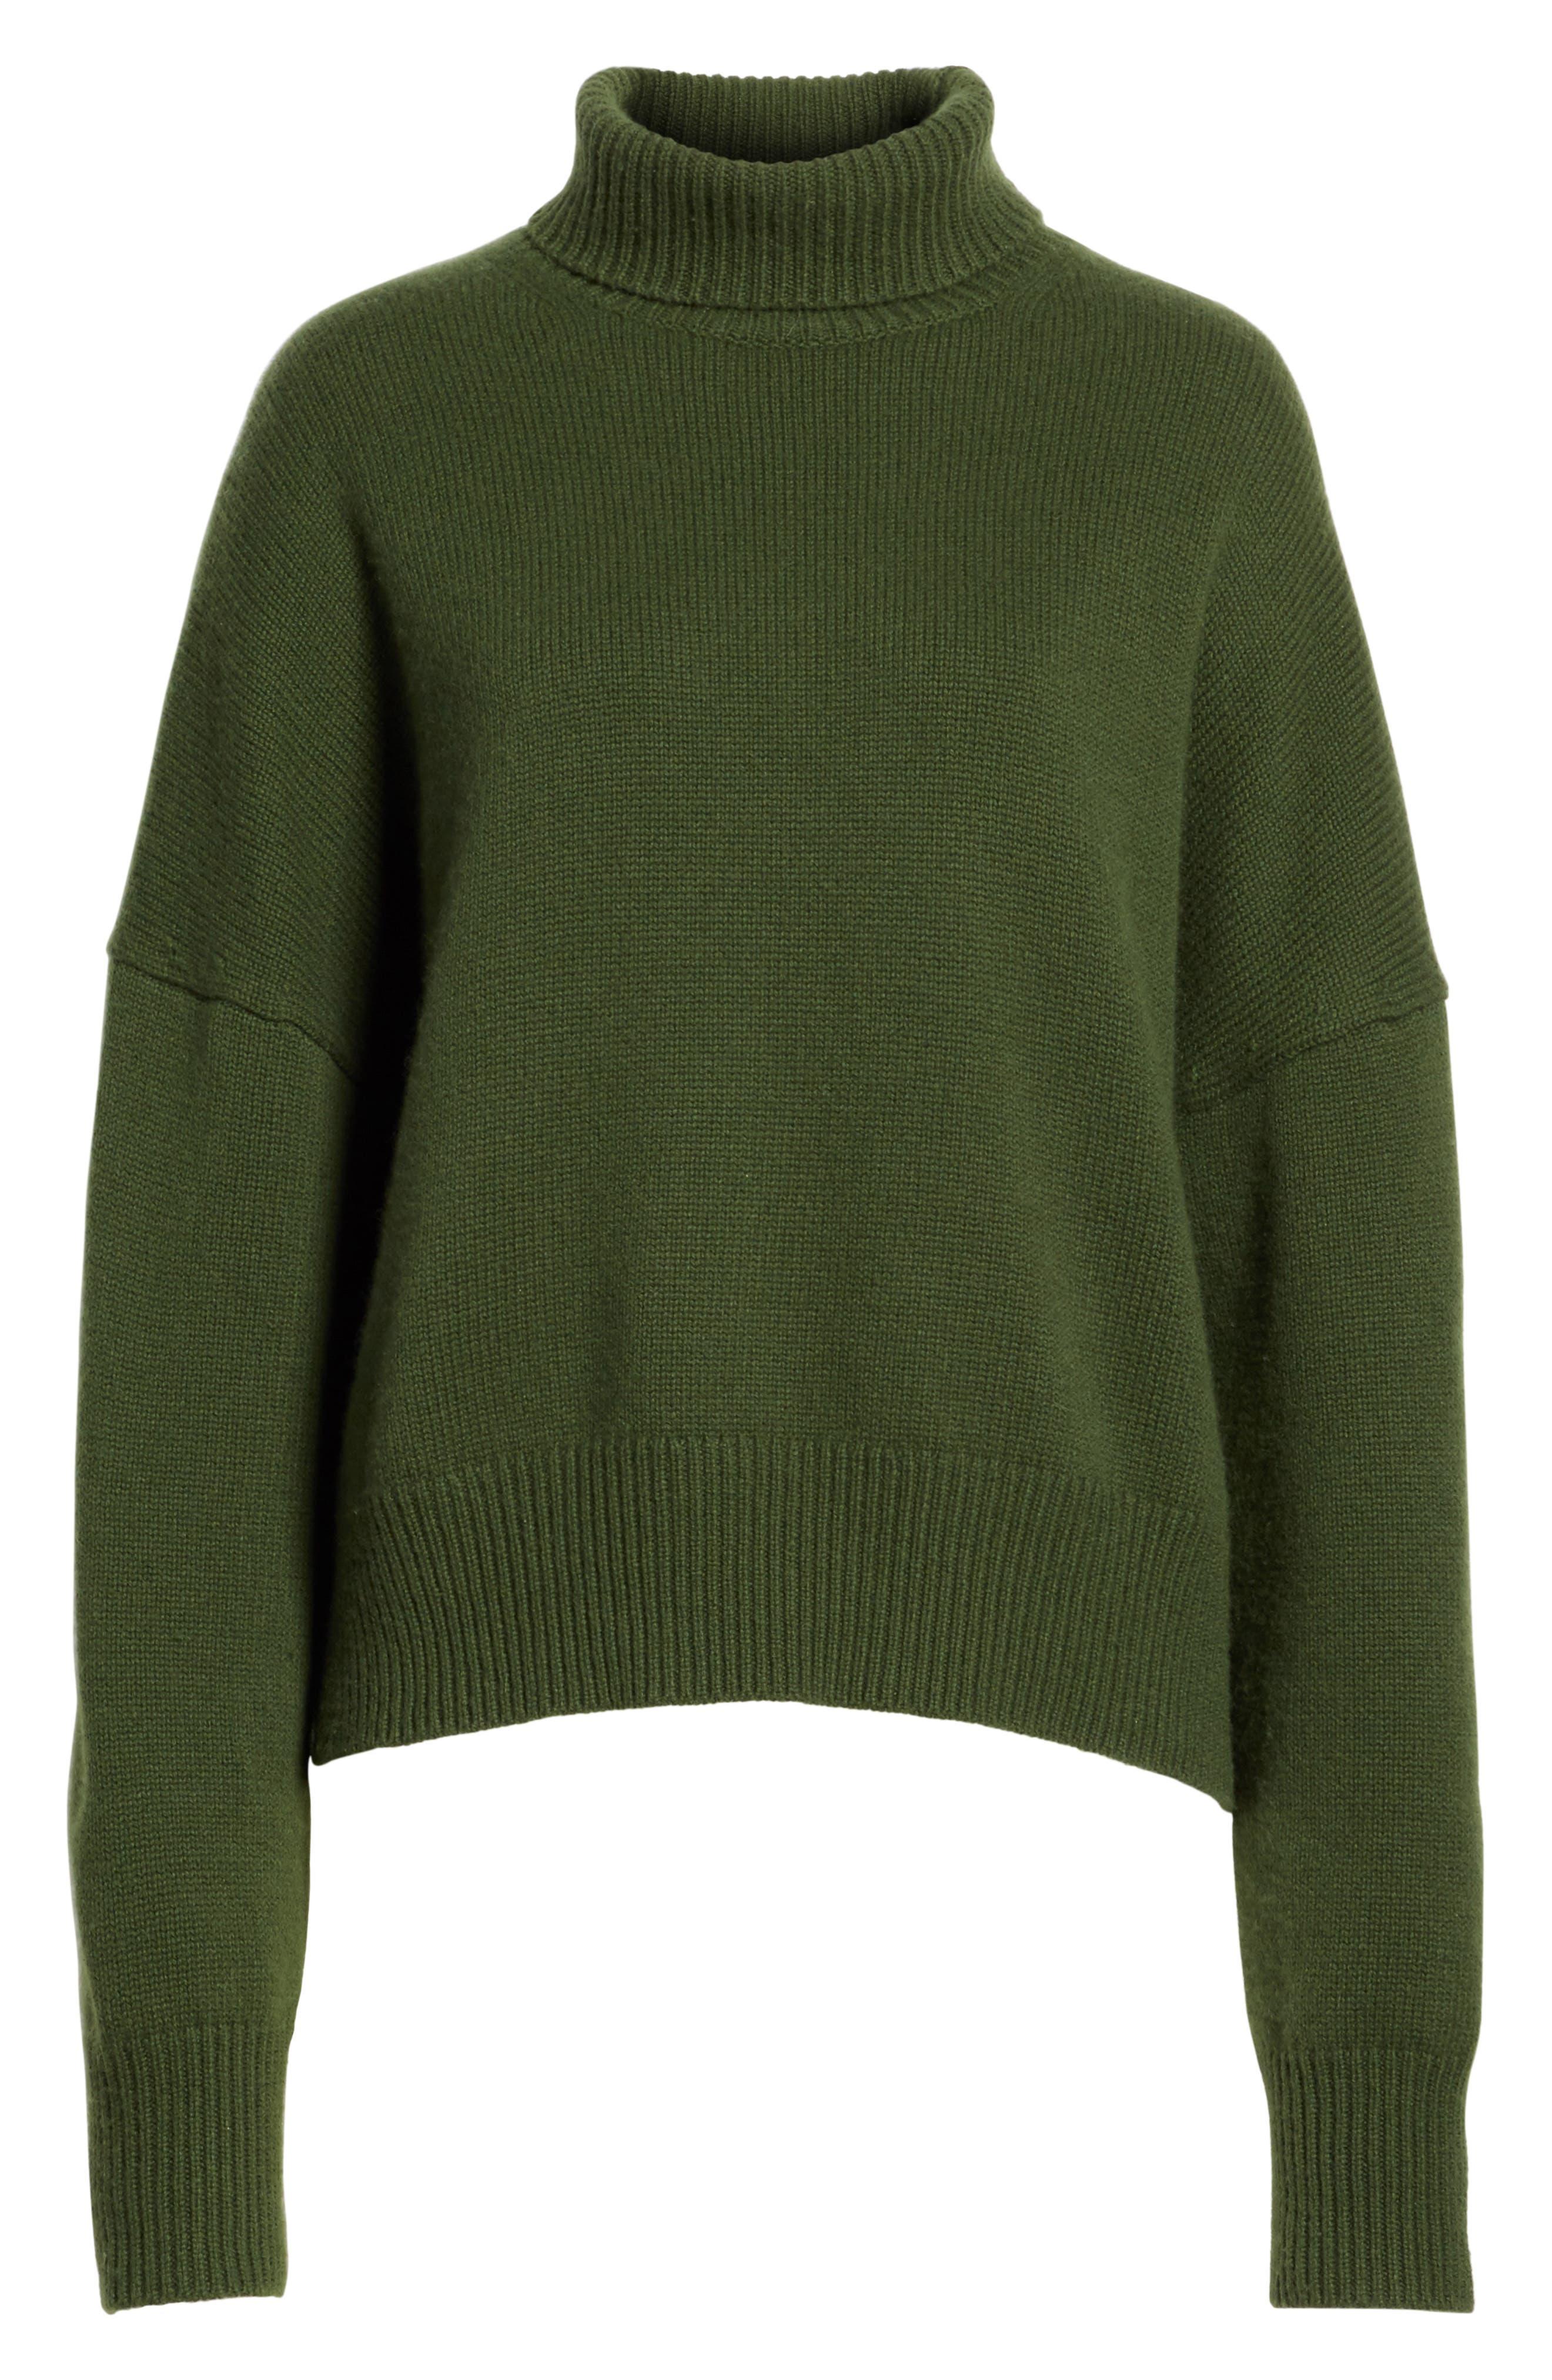 Serinda Wool & Cashmere Turtleneck Sweater,                             Alternate thumbnail 6, color,                             303